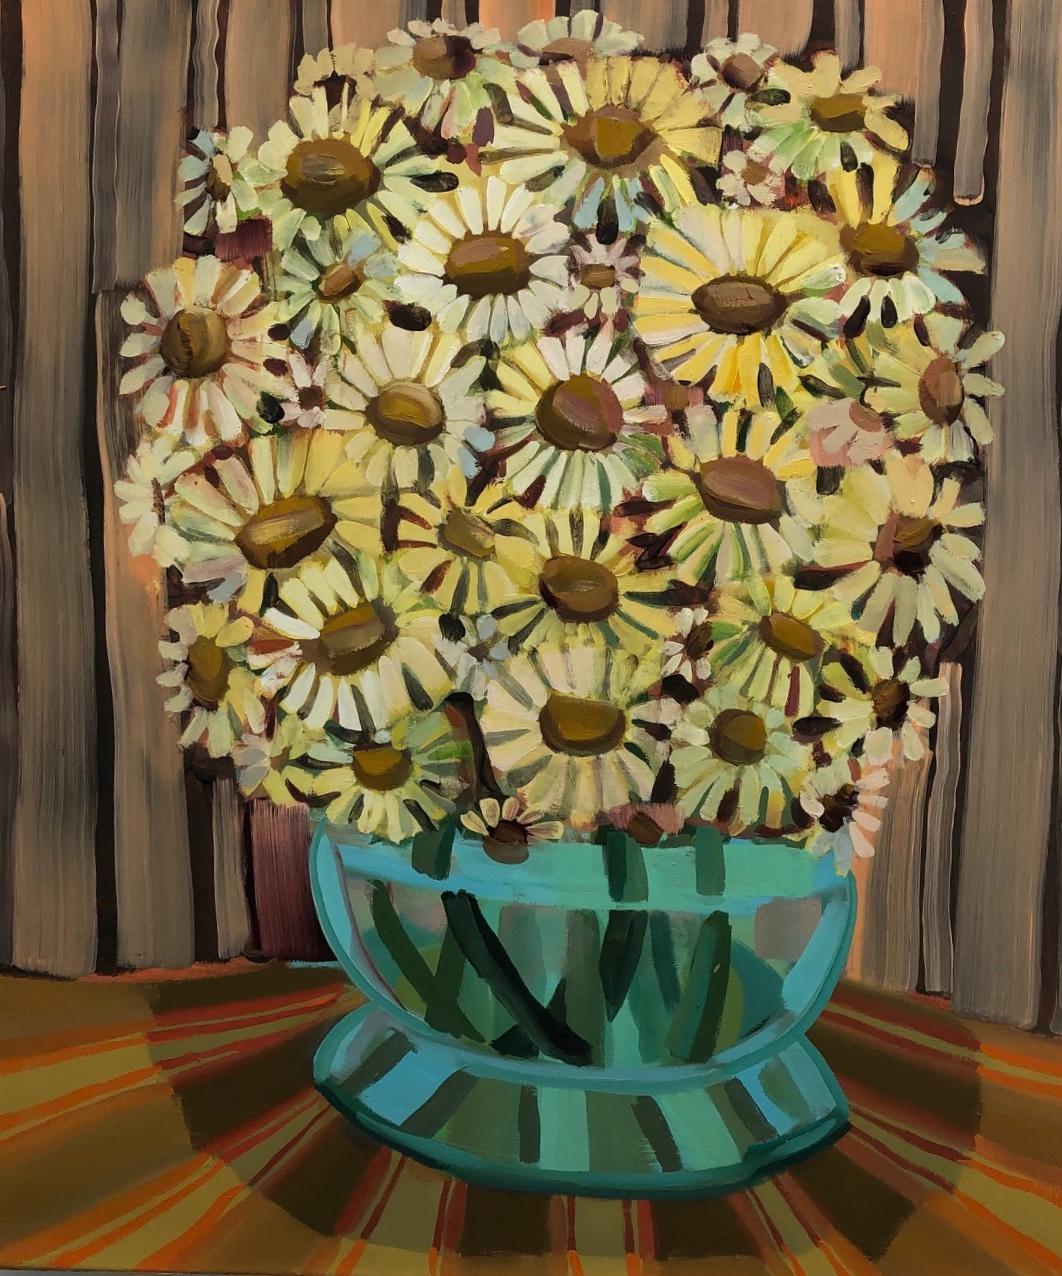 Judith Linares flowers 1.jpg